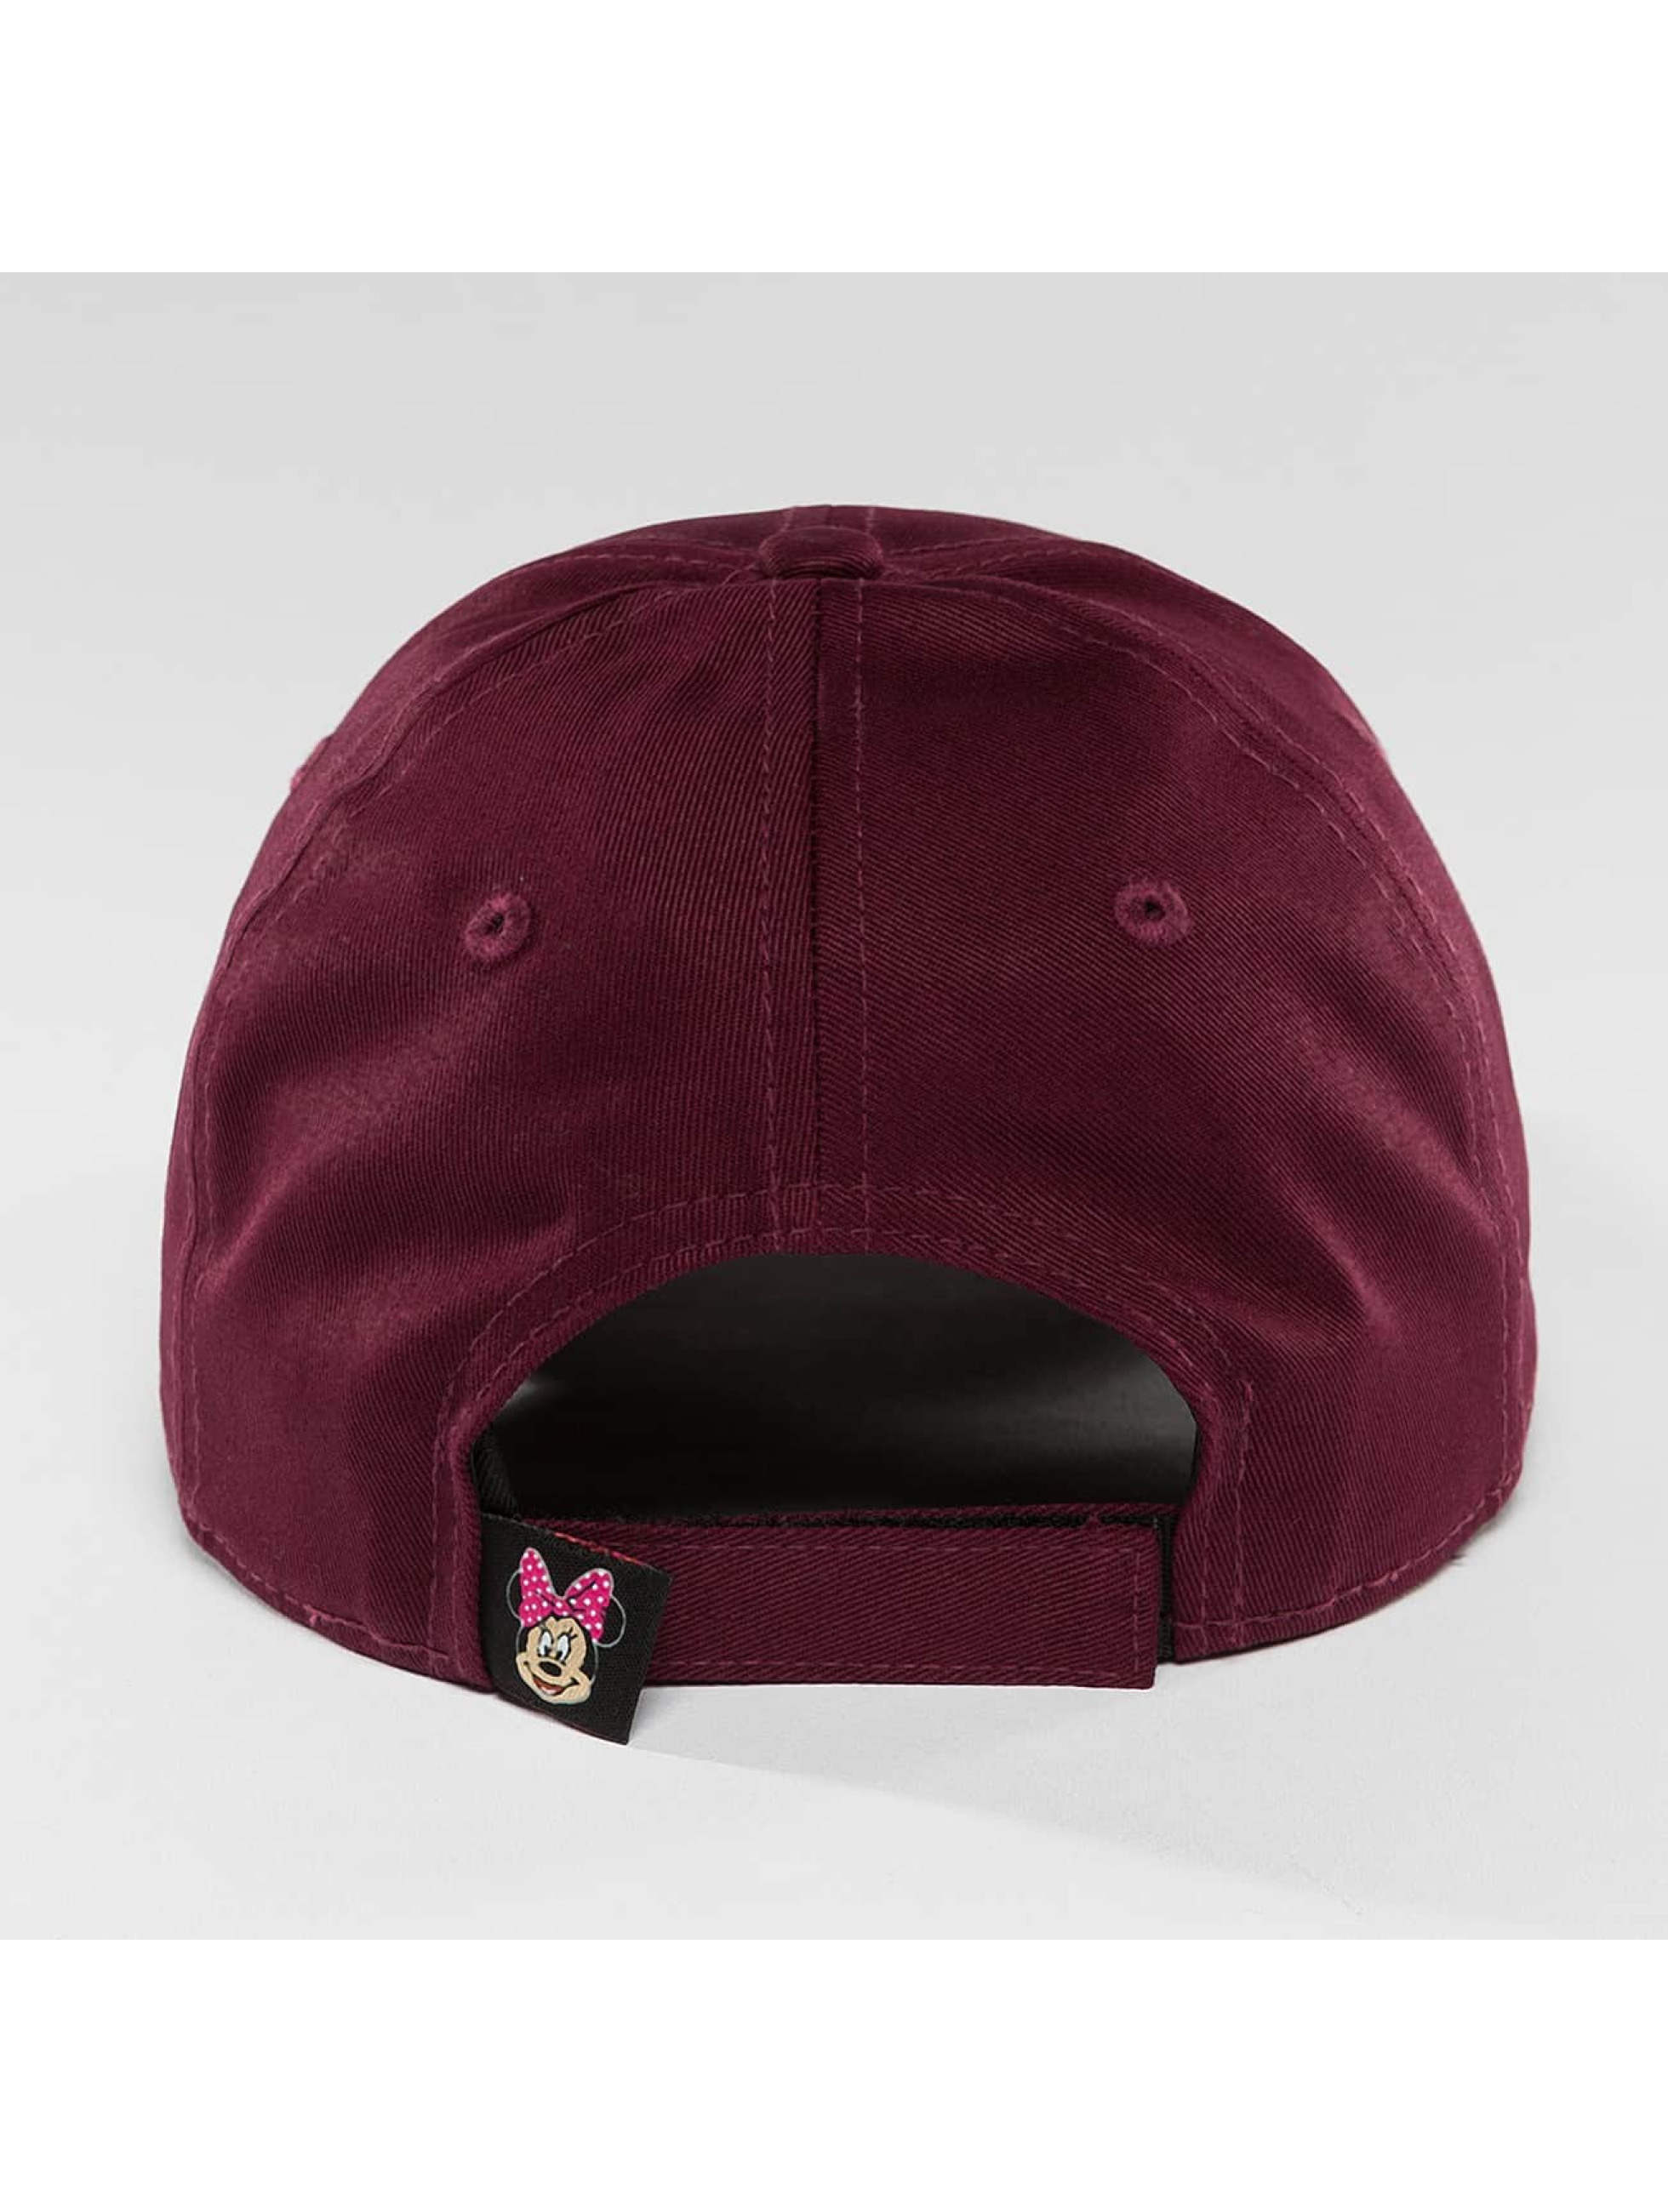 New Era Snapback Cap Disney Silhoutte Minnie Maus red